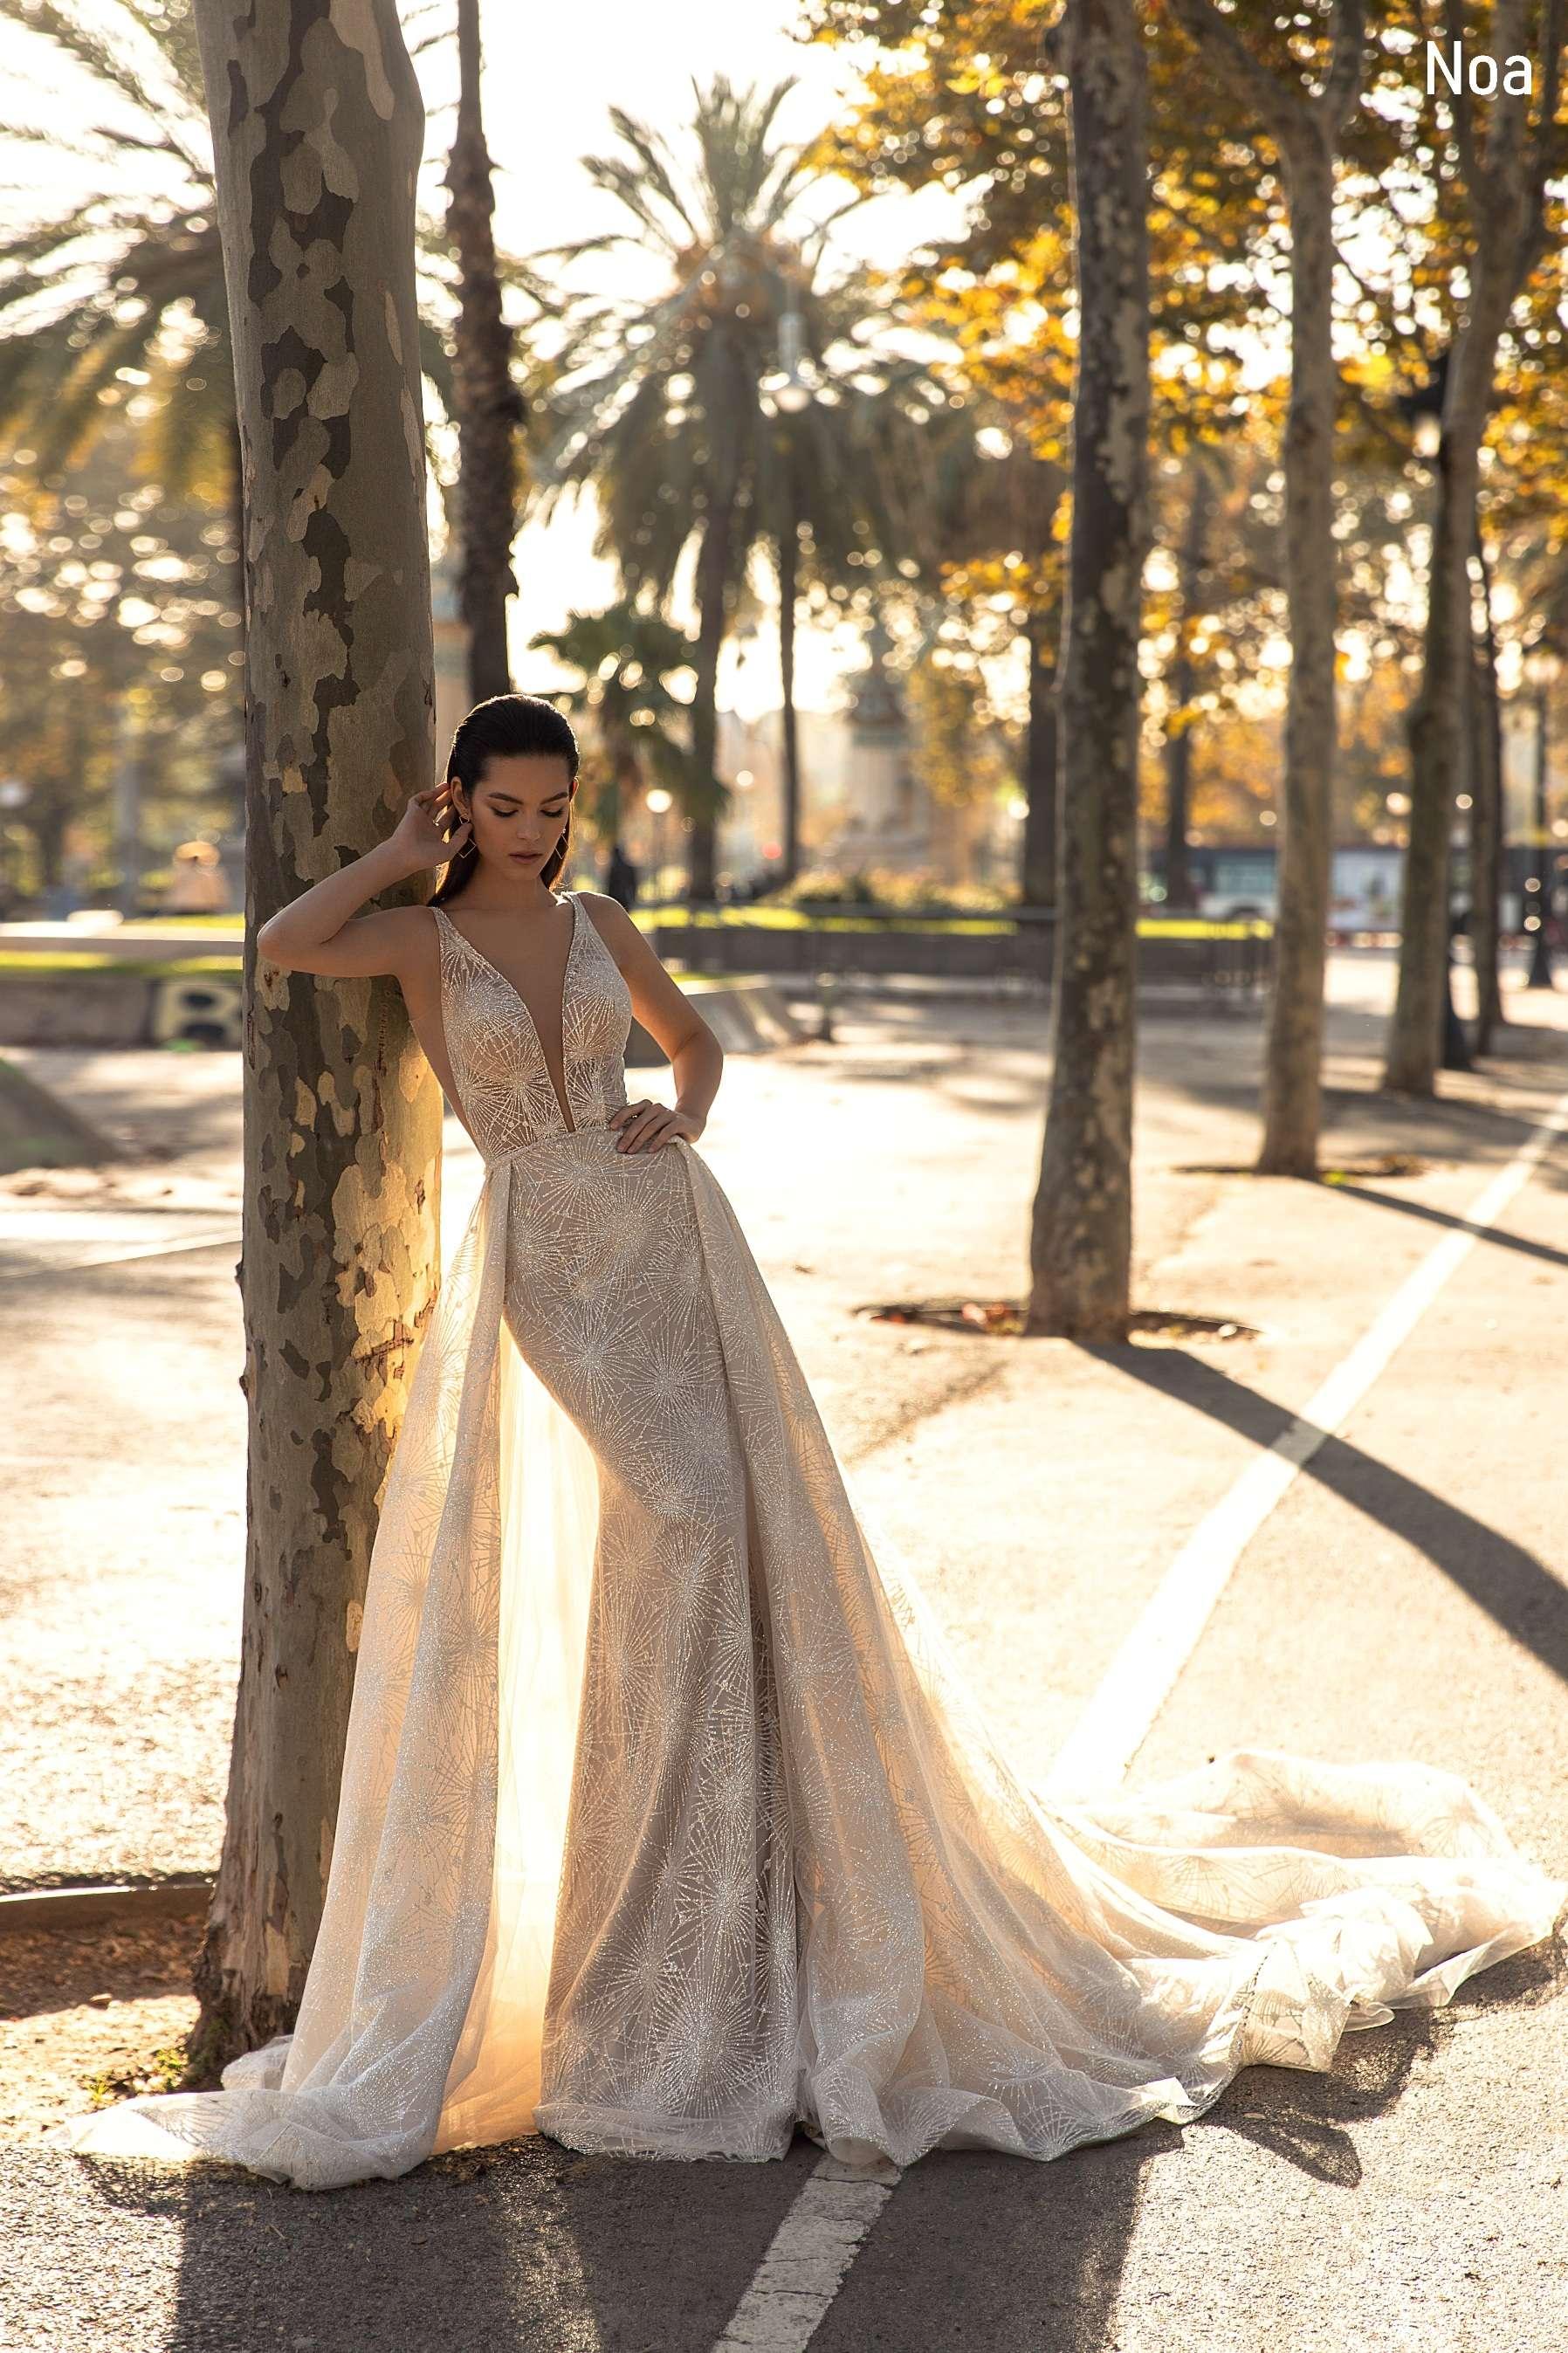 свадебное платье Noa_(1).1800x1800w